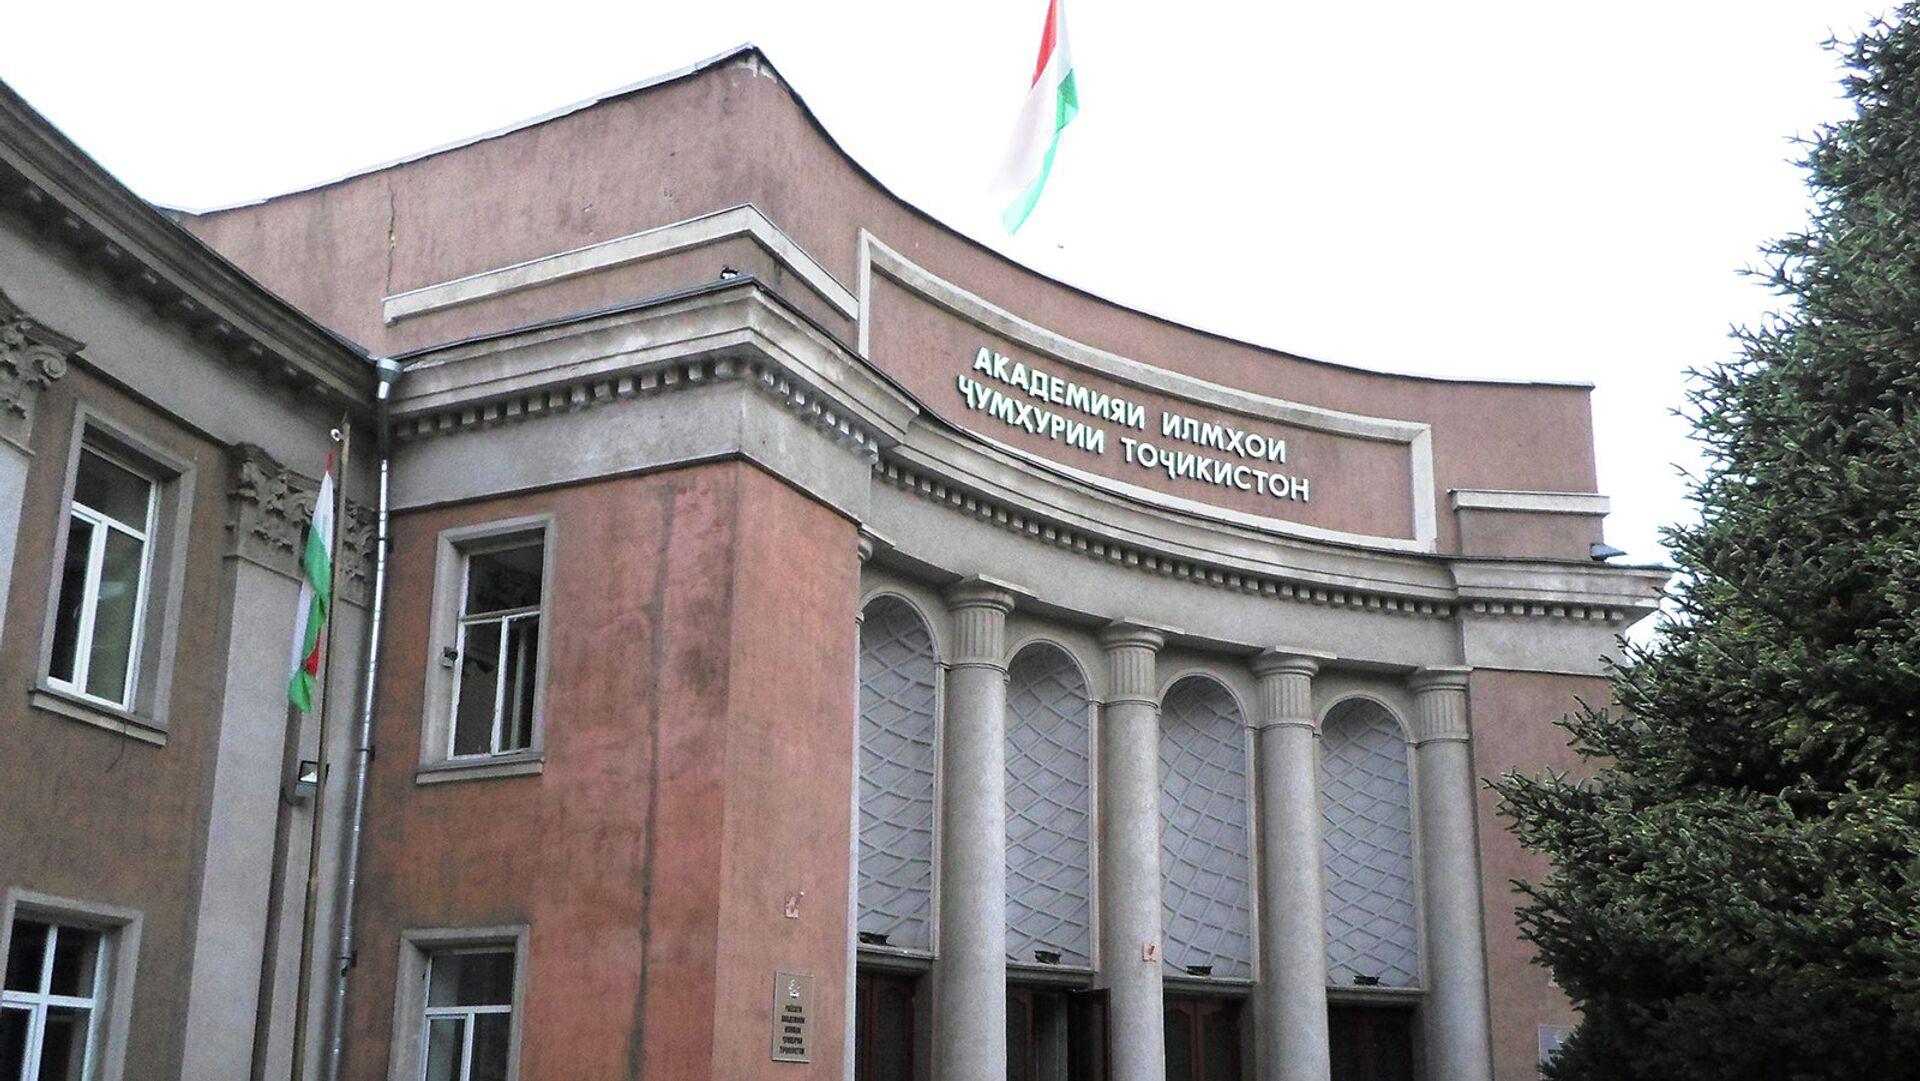 Здание Академии наук Таджикистана, архивное фото - Sputnik Таджикистан, 1920, 21.09.2021